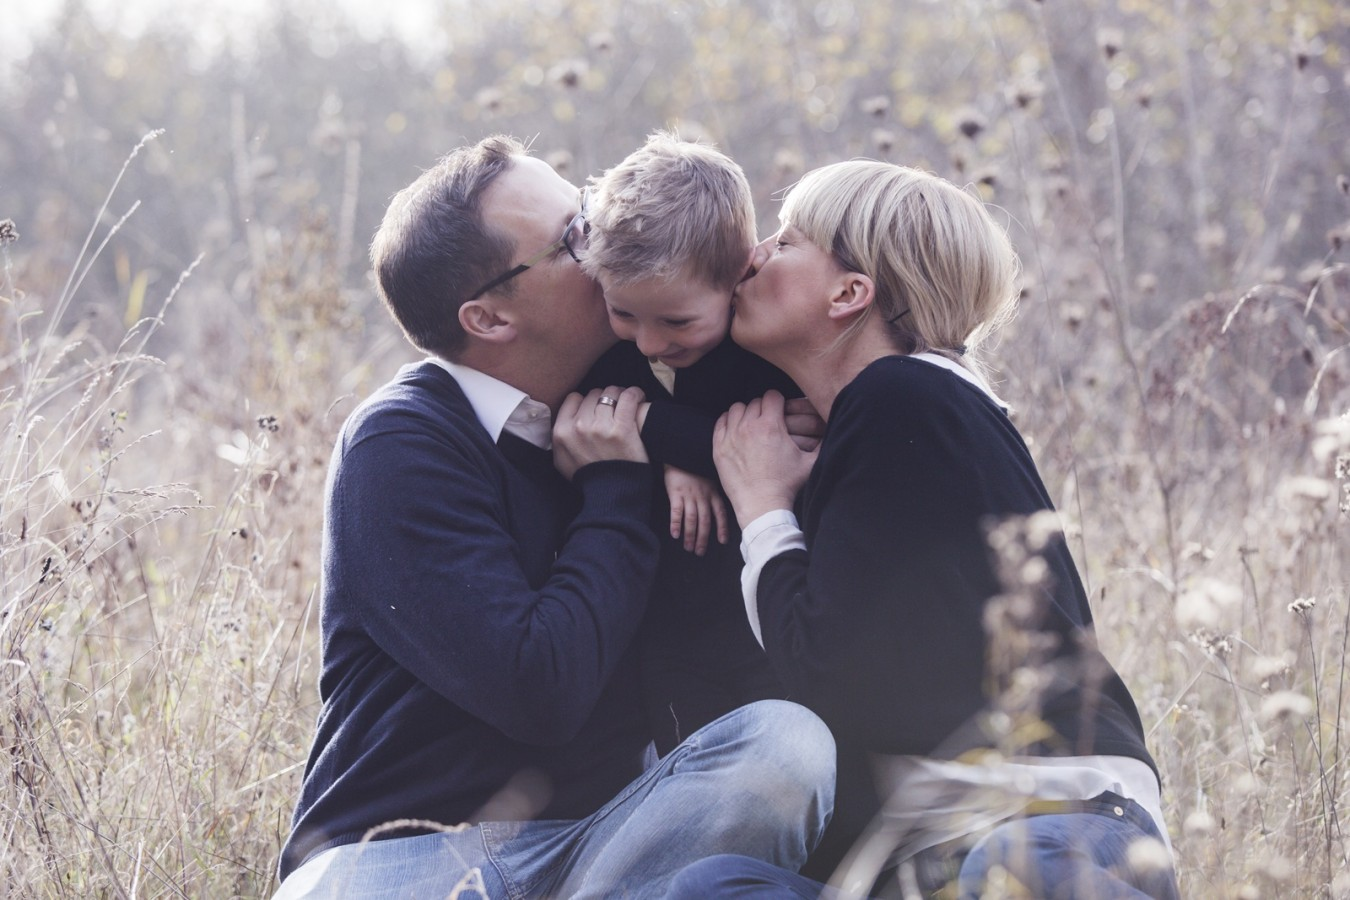 familienfotos-fotograf-wuerzburg13